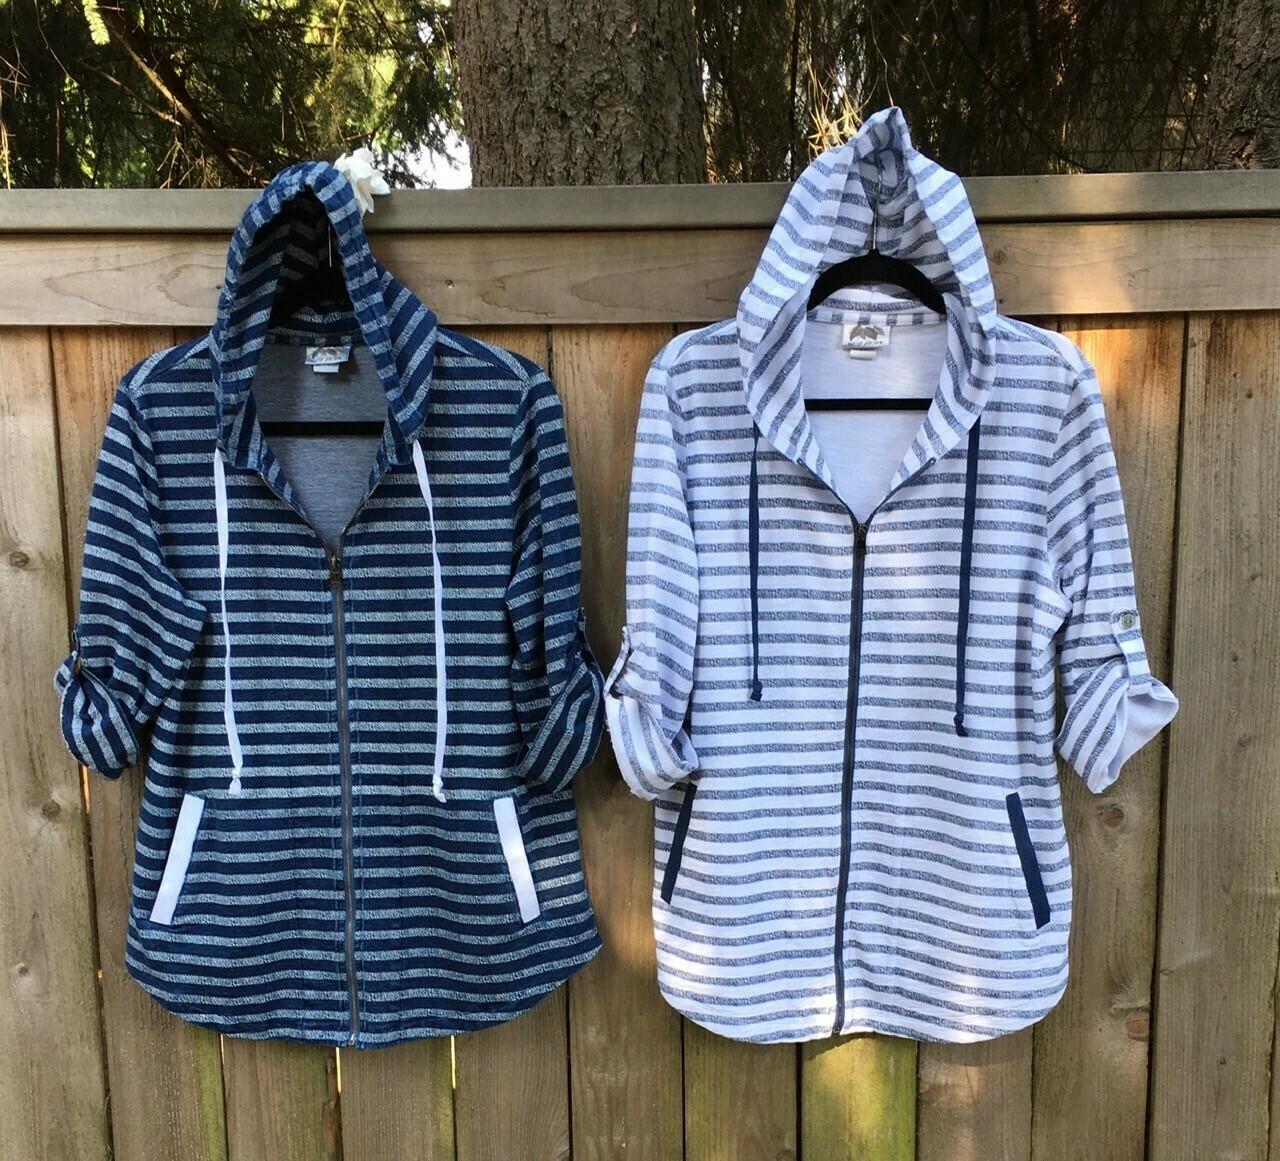 Shadow 3/4 Sleeve Jacket - White/Denim